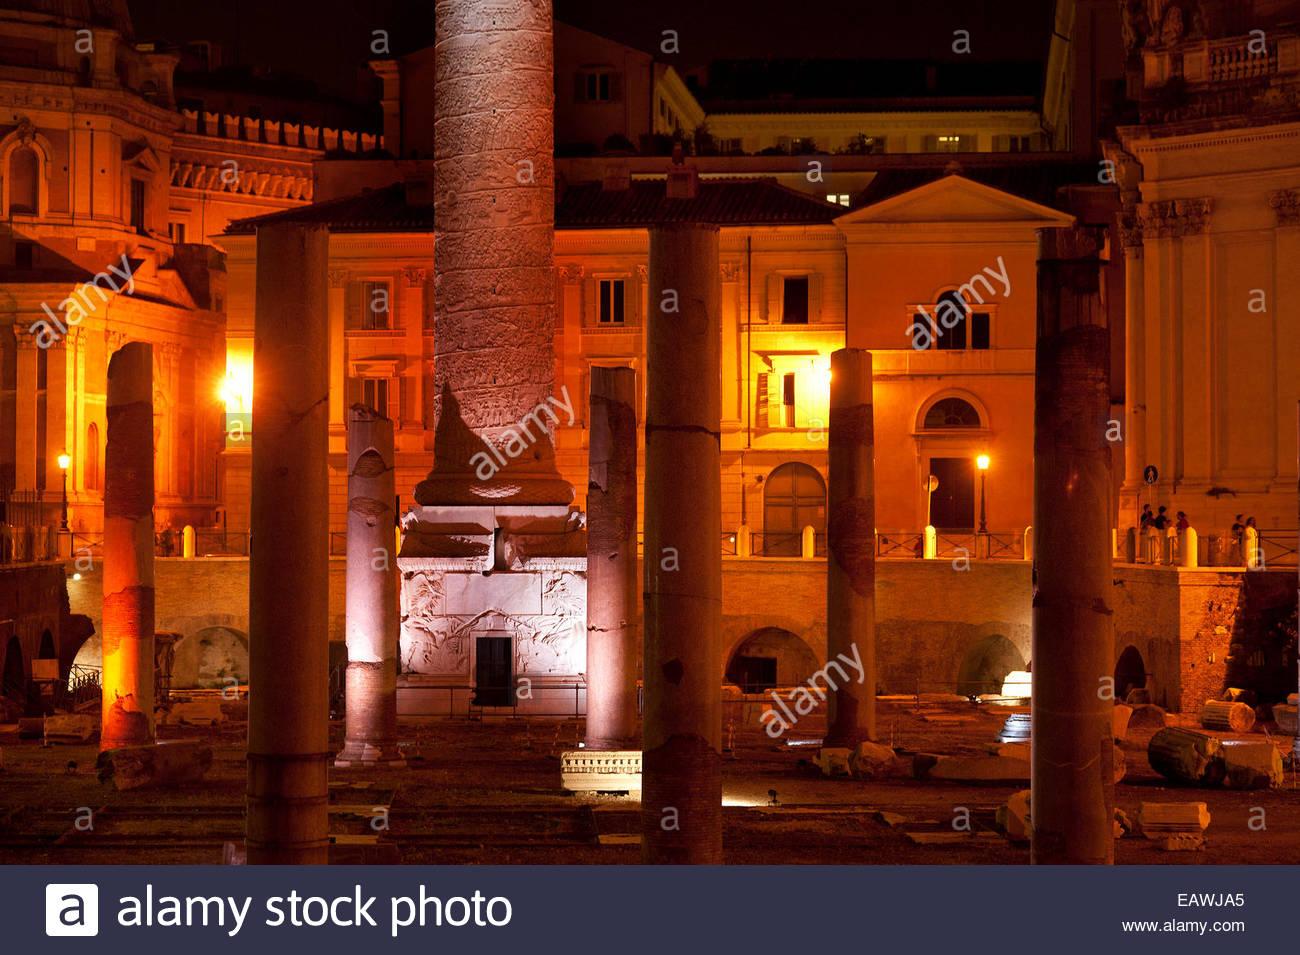 Lights illuminate the base of Trajan's Colum at night. - Stock Image